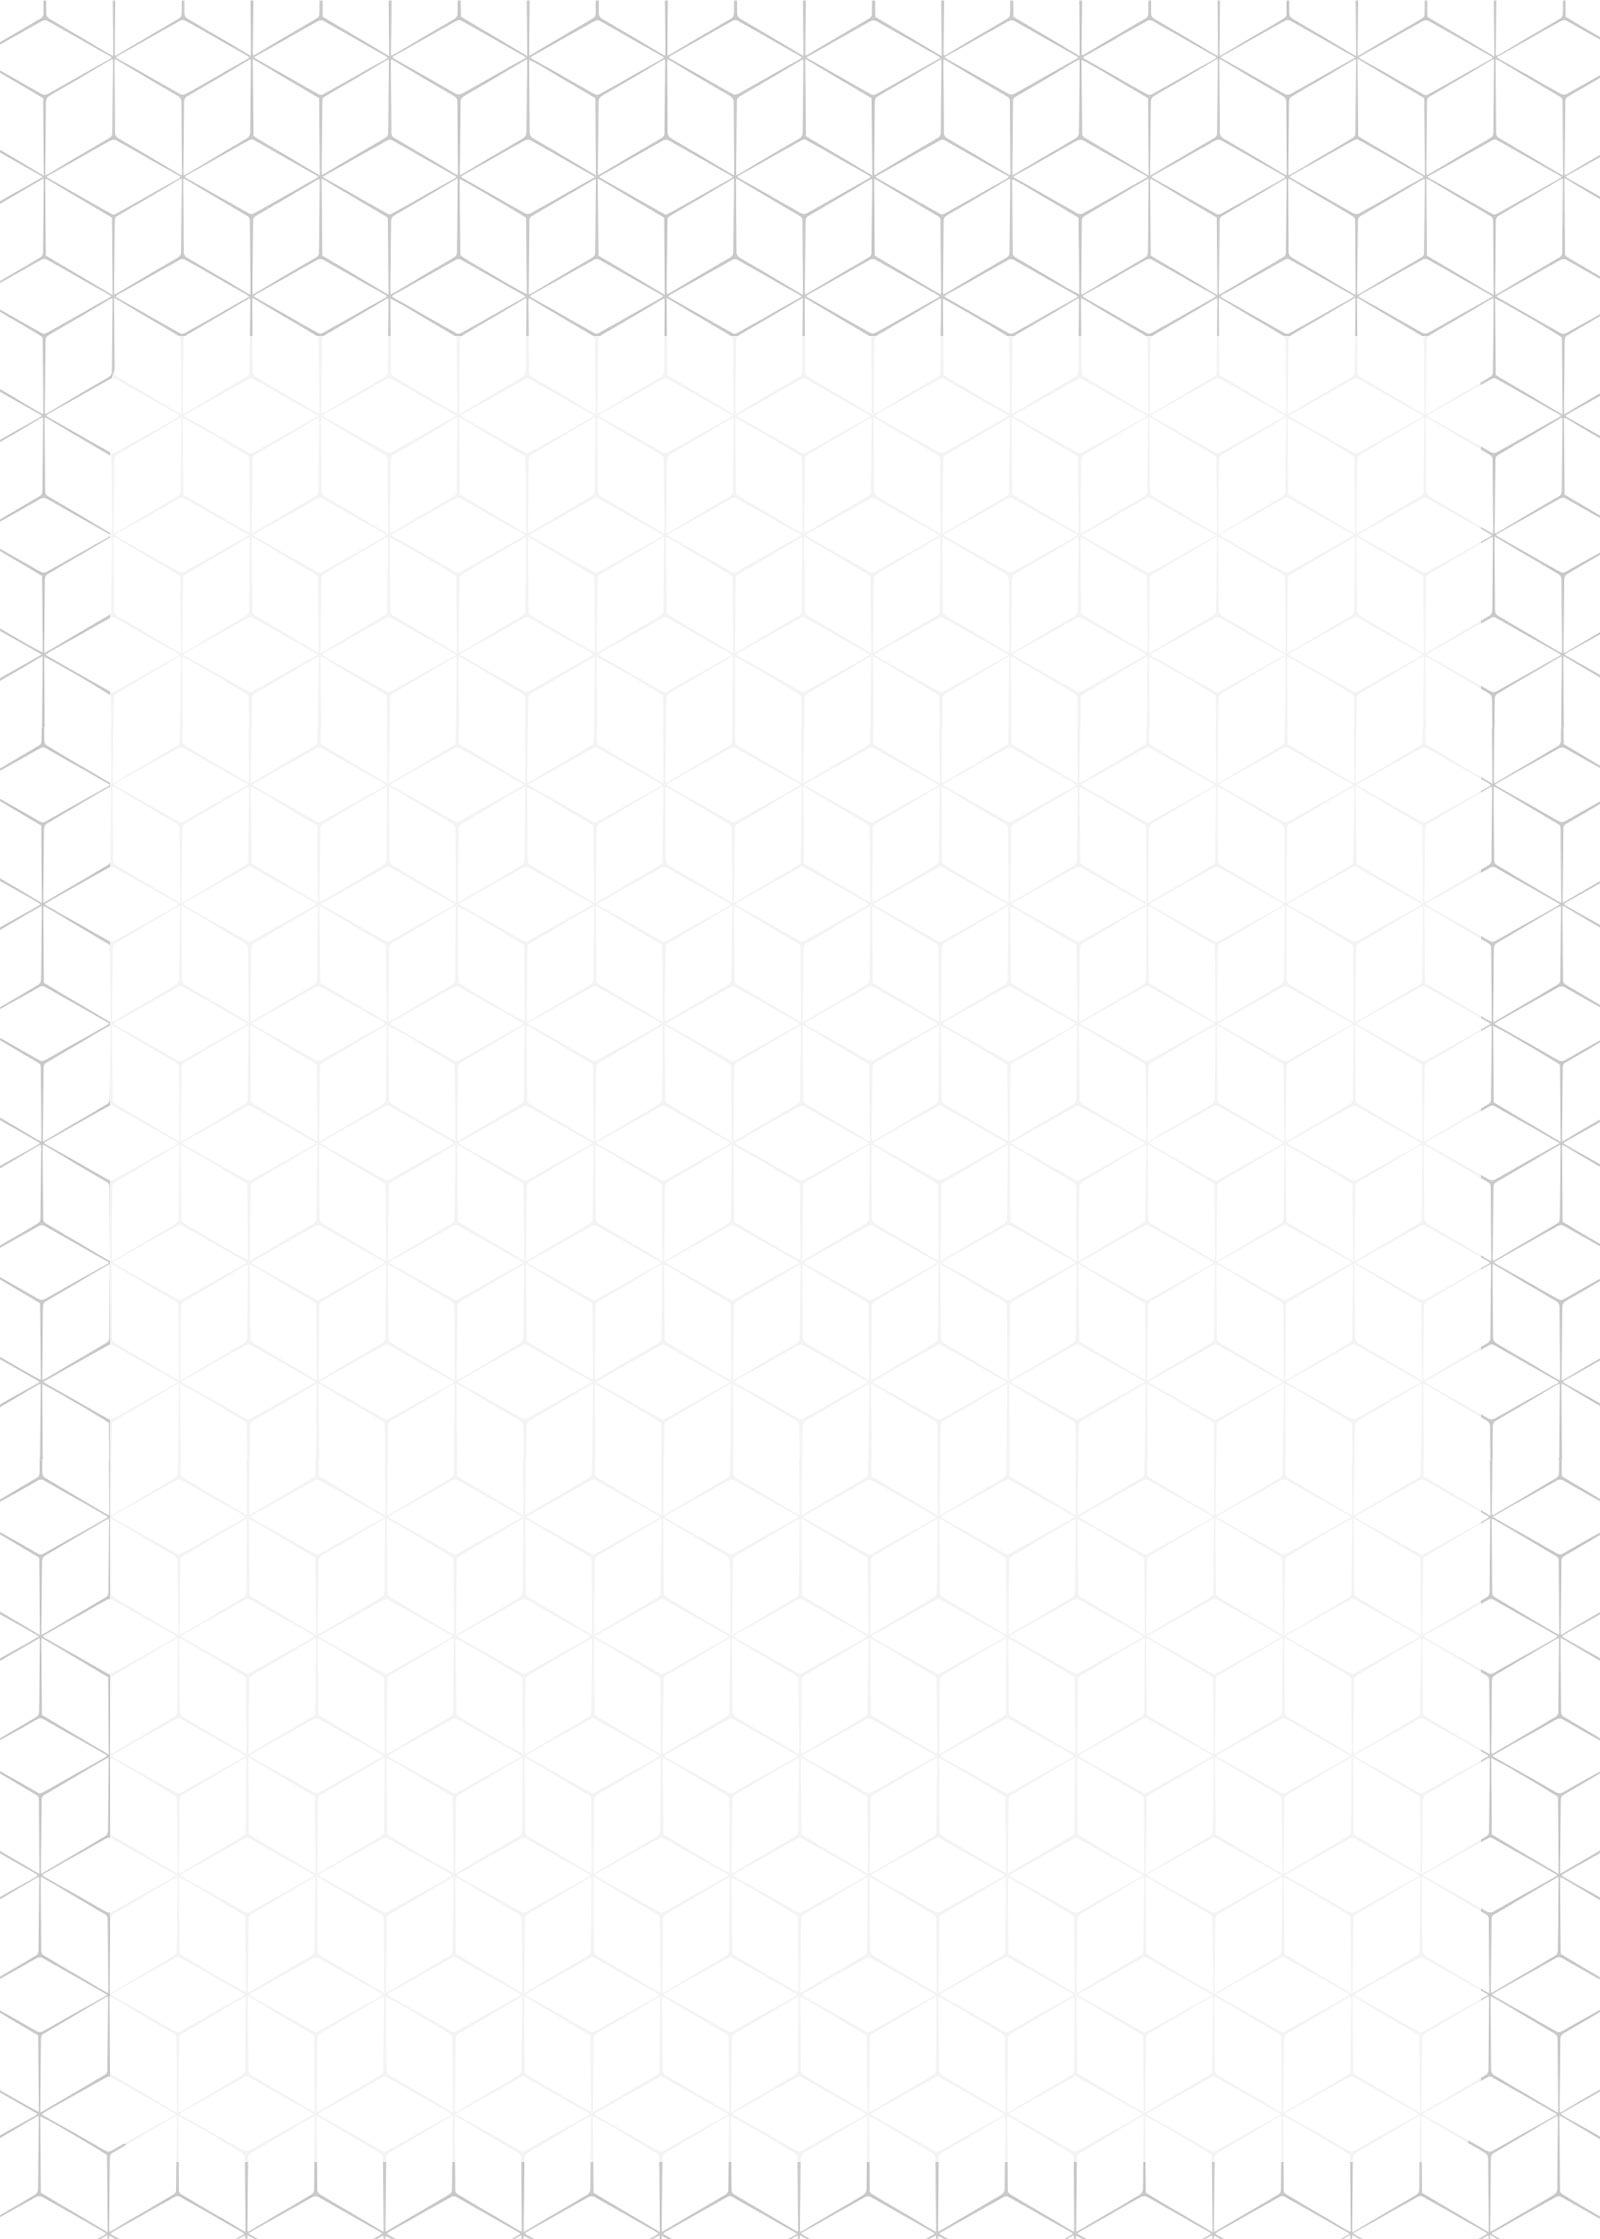 Planner Preto e Branco Molde em Branco